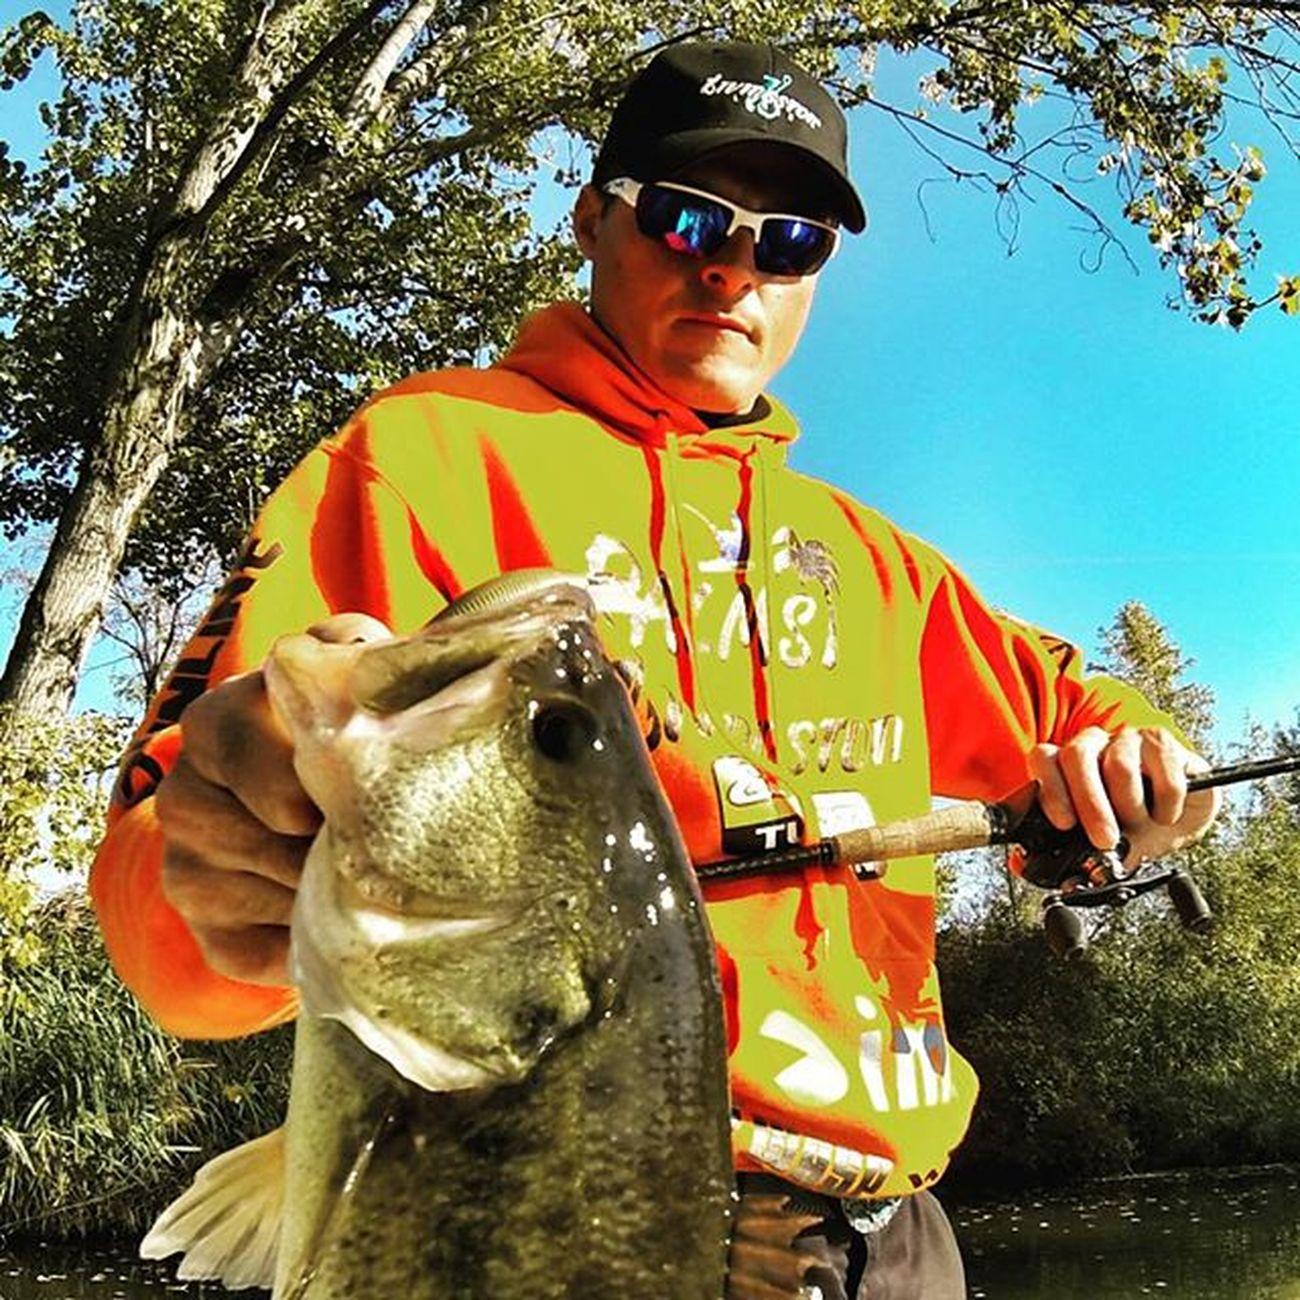 Still working with crankbait in this fall season! Crankbait Bass Teamlivingston Livingstonlures Livingstonluresfamily Livingstonluresprostaff Primetime Bassfishing Powerfishingcrank Wileyxglasses